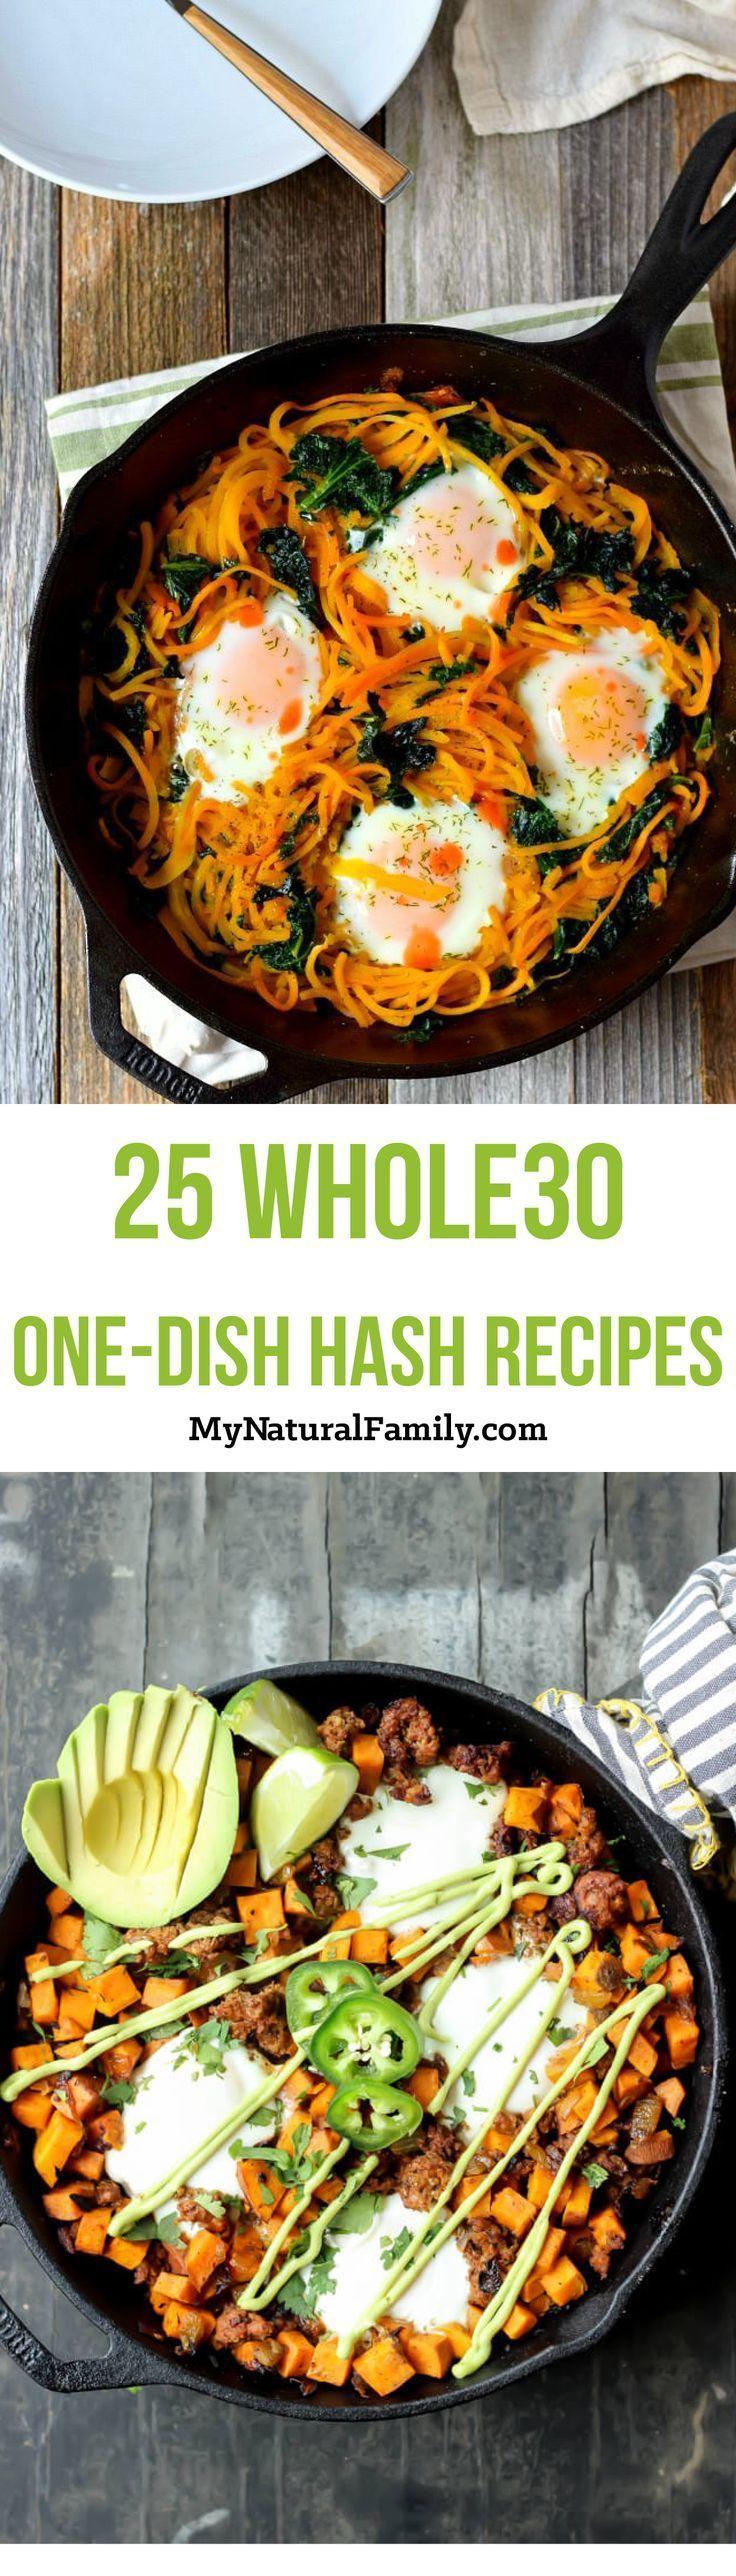 25 Whole30 Breakfast One Dish Hash Recipes